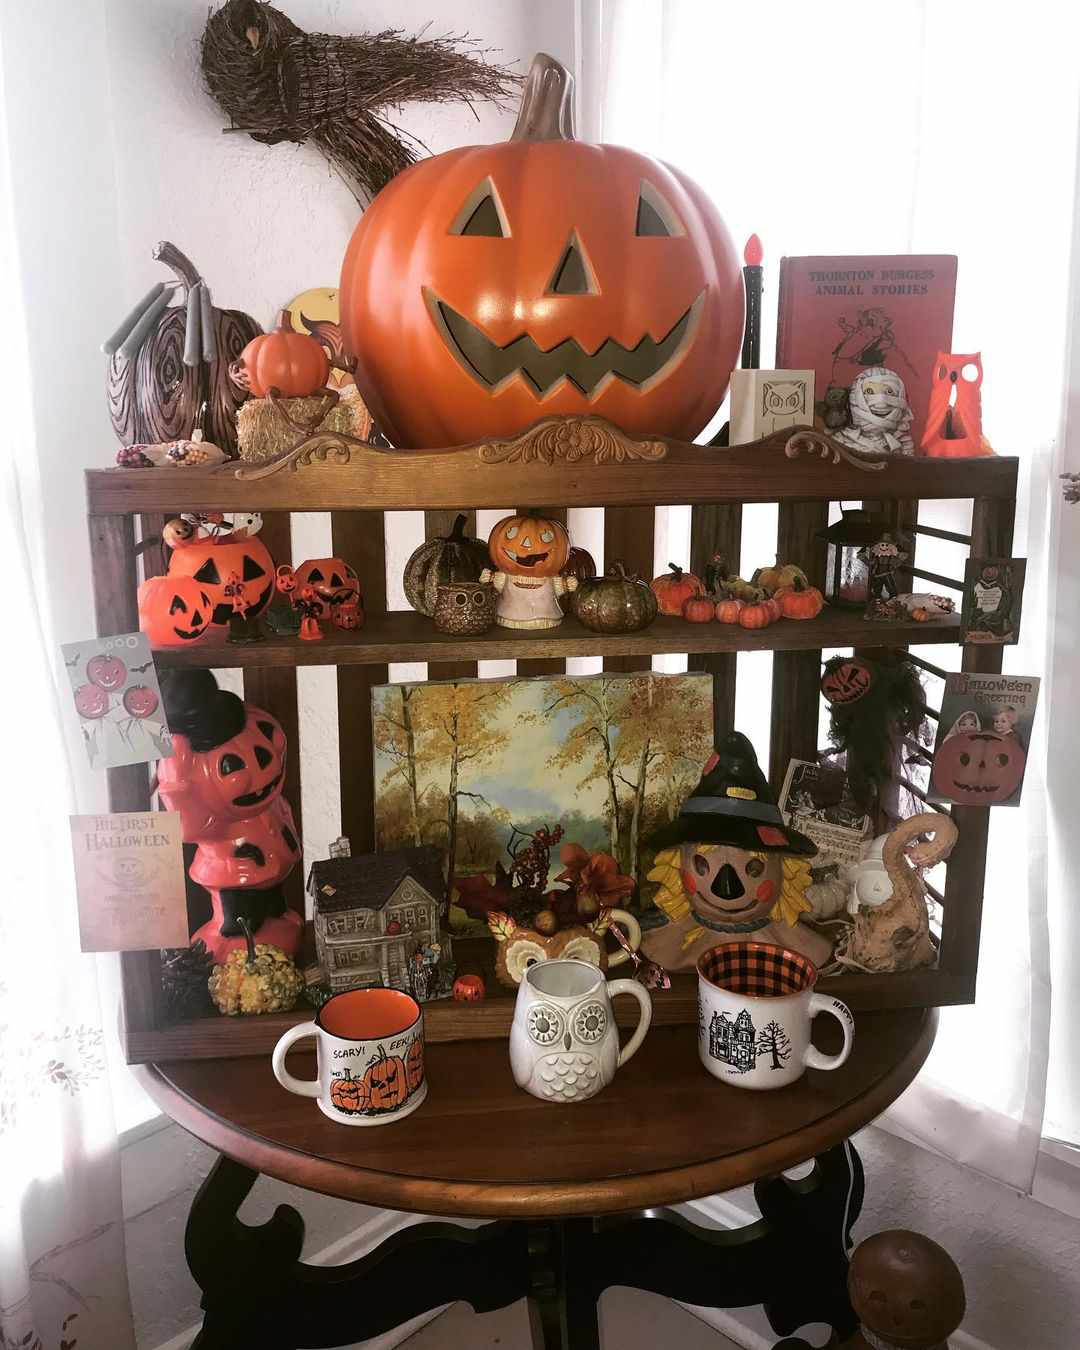 Old chicken shelf with retro Halloween decor.